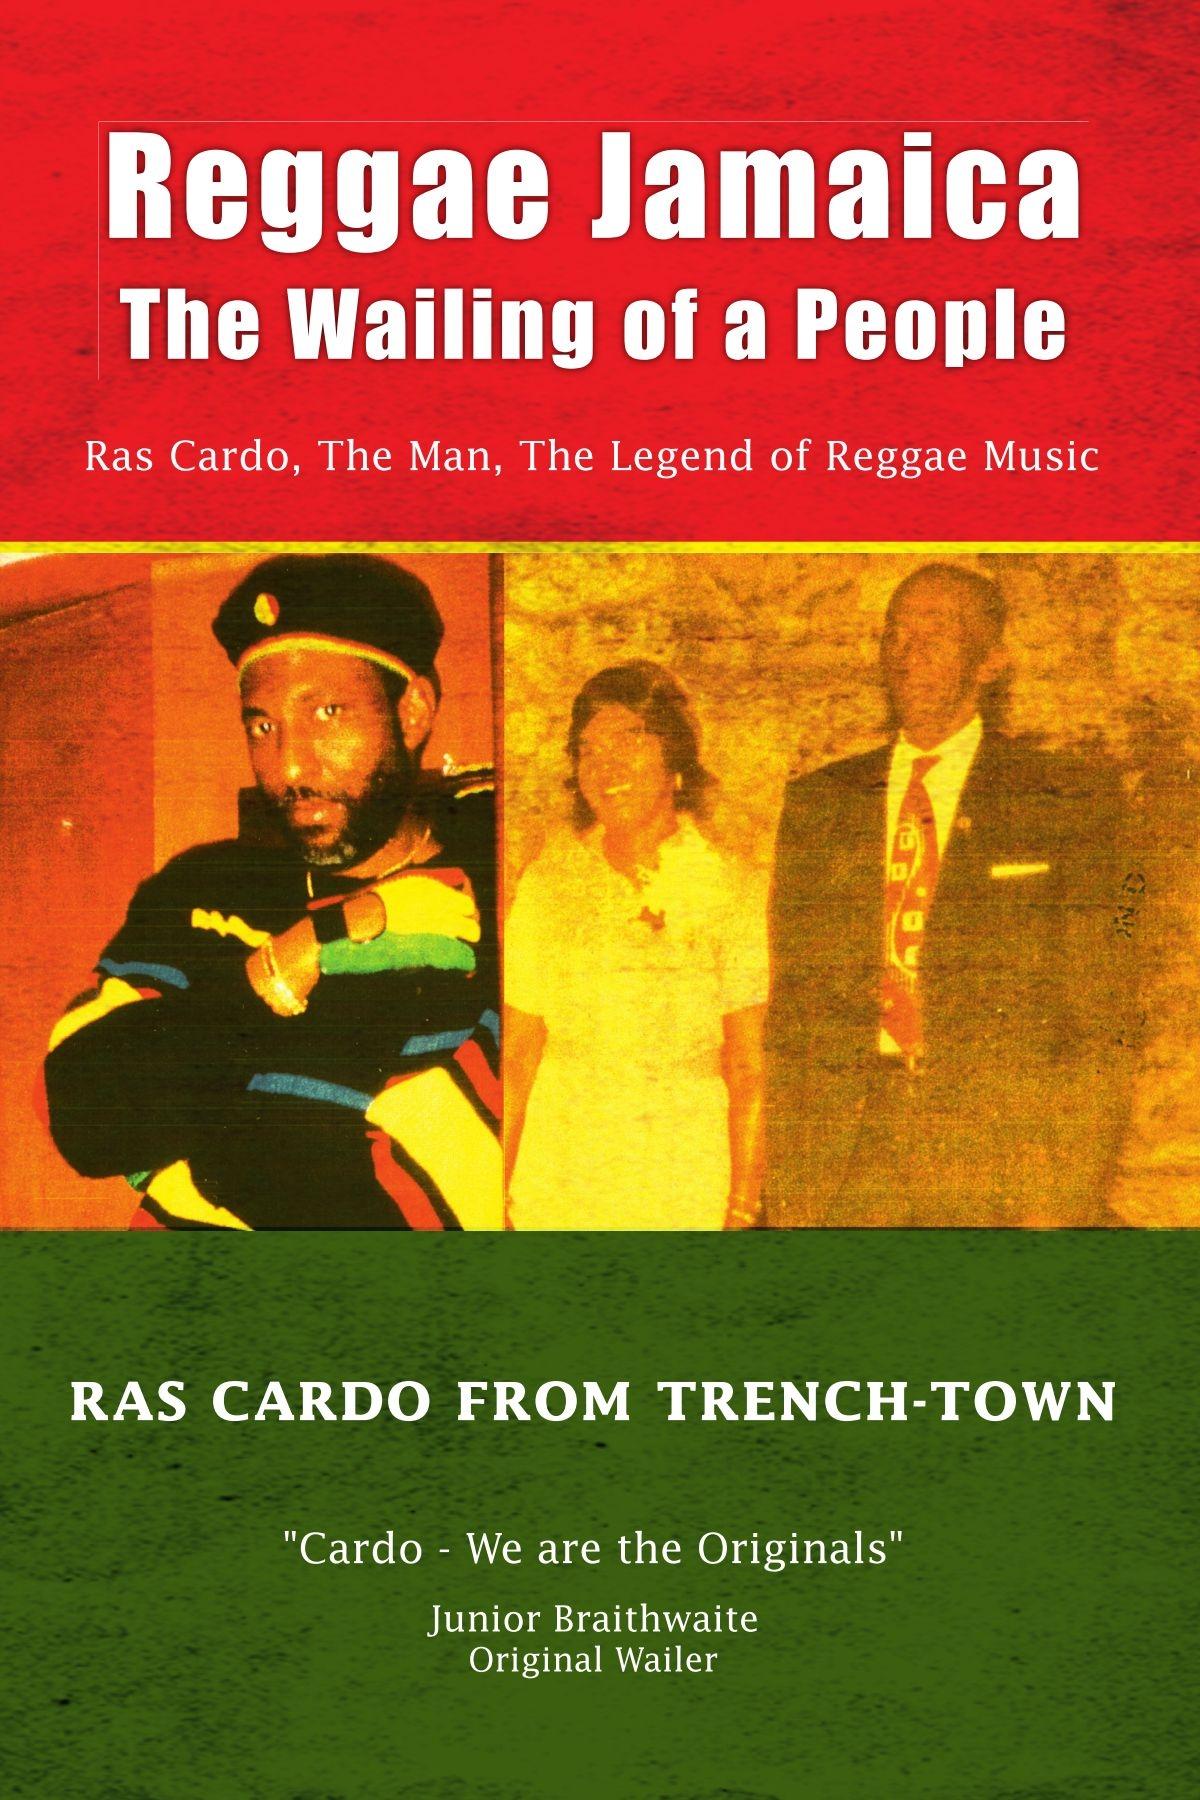 Reggae Jamaica - The Wailing of a People: Ras Cardo, The Man, The Legend of Reggae Music: Ras Cardo, The Man, The Legend of Reggae Music